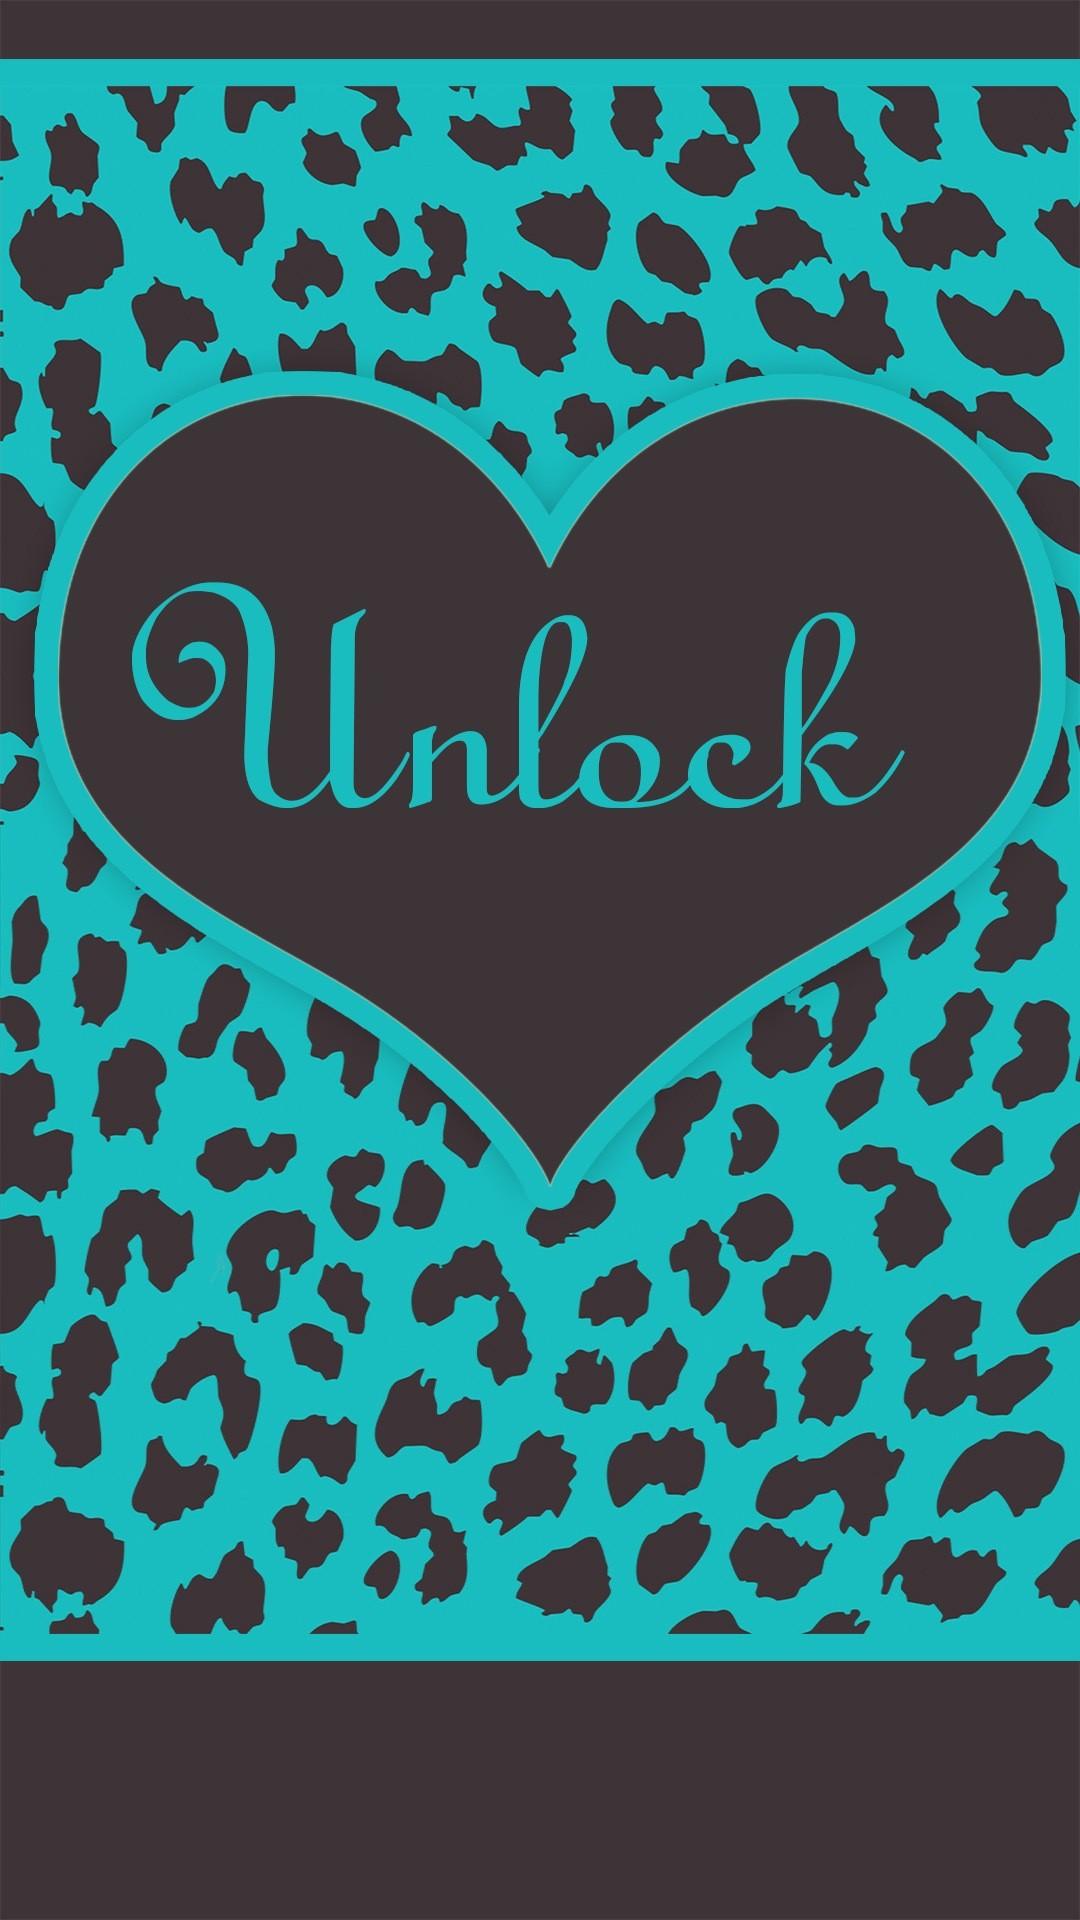 girly iphone lock screen wallpaper A86